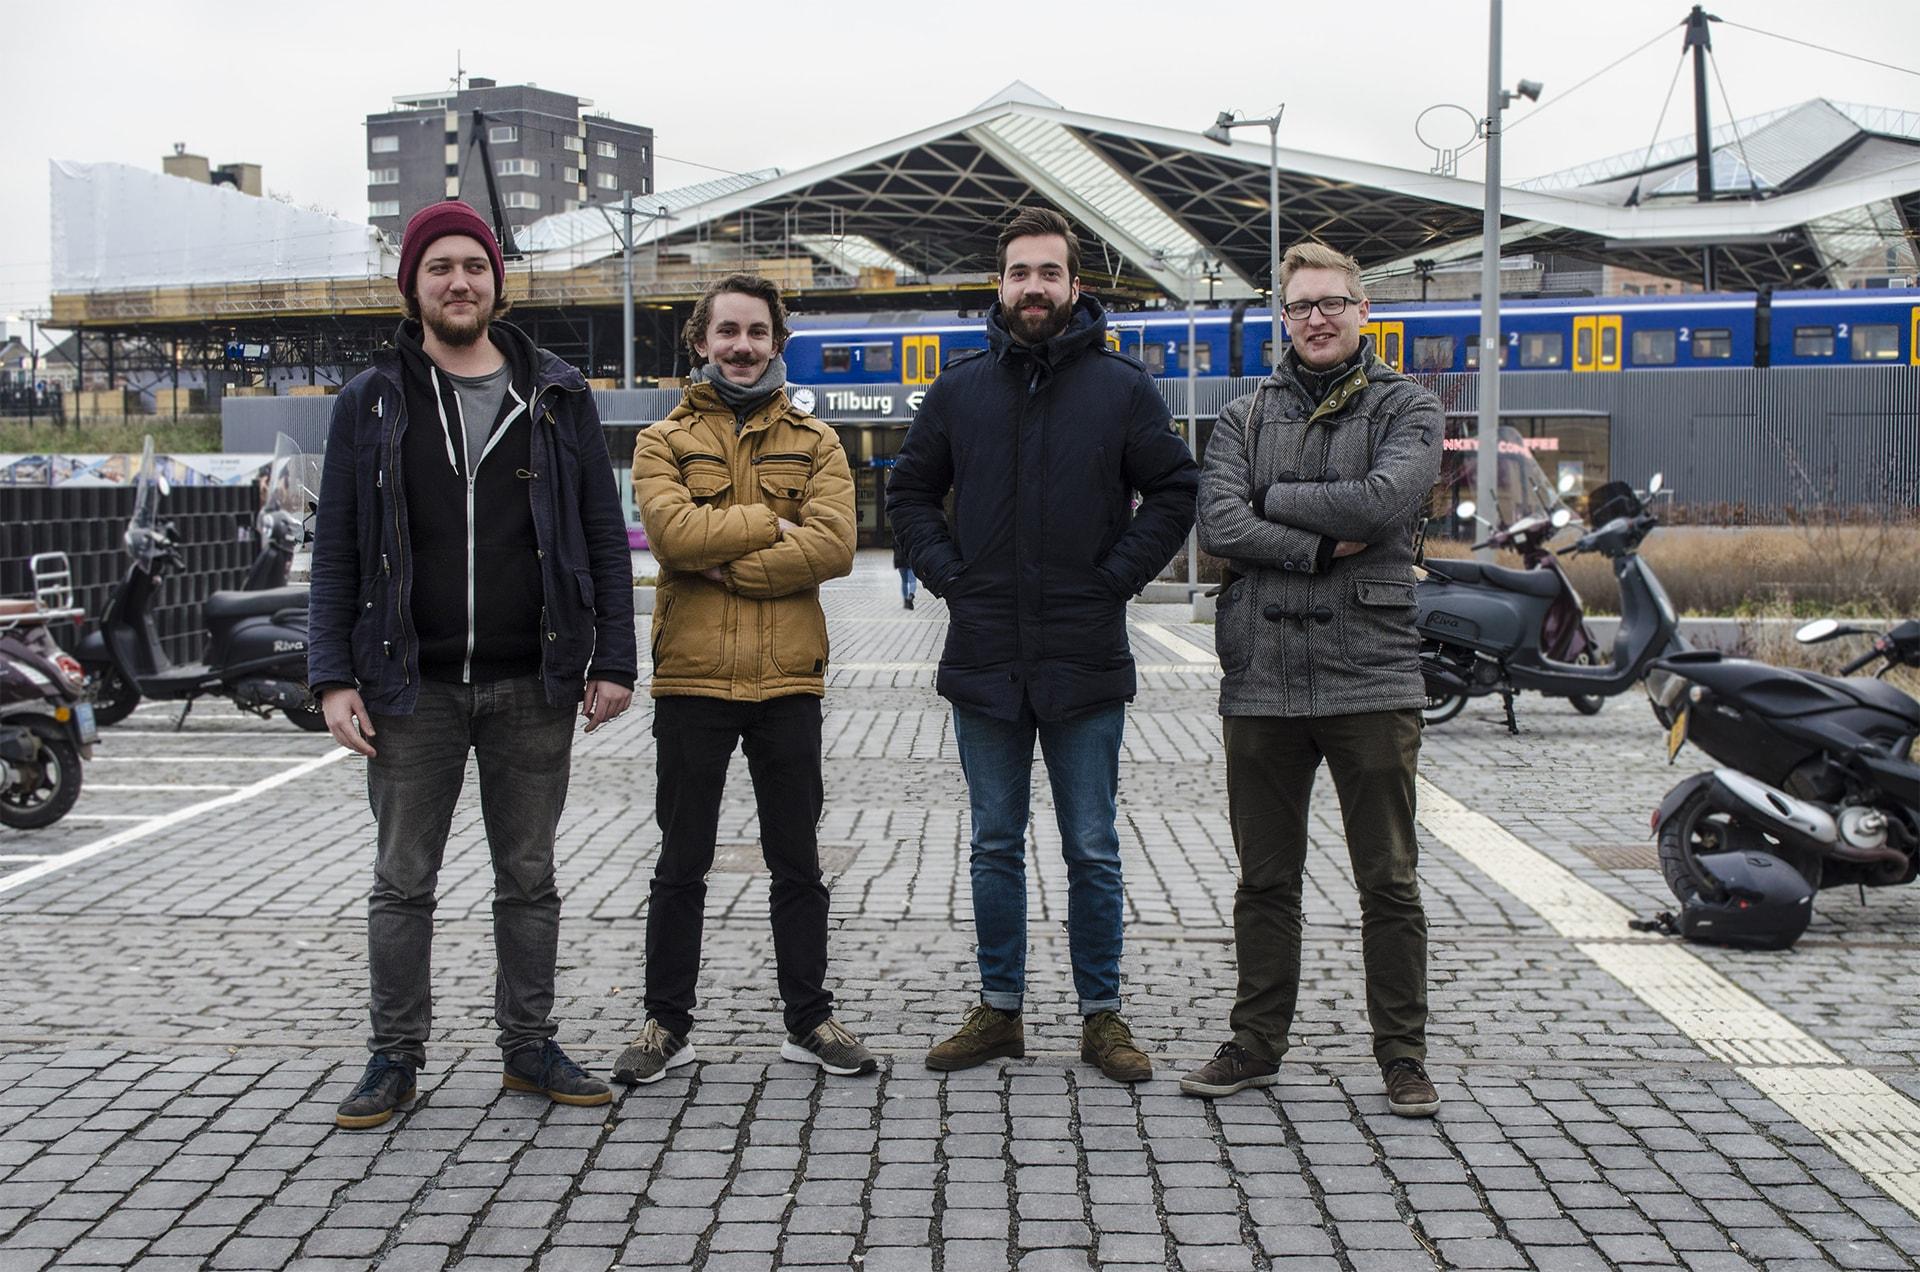 Rico, Vincent, Job en Luuk van scrumble op station Tilburg.